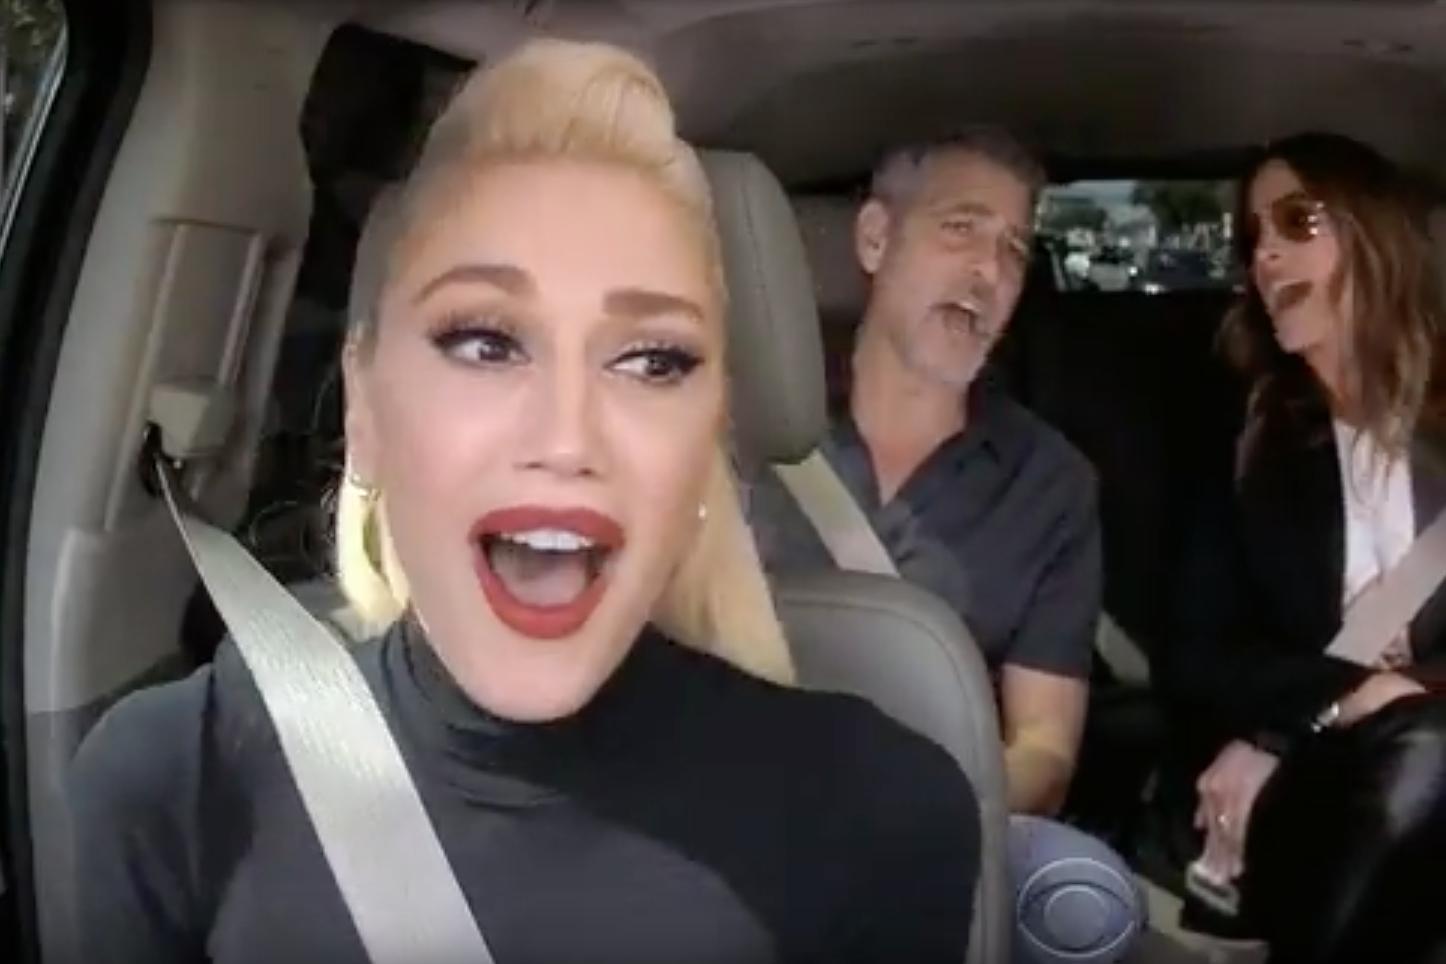 What Is Hov Lane >> Gwen Stefani, George Clooney, and Julia Roberts Descend on James Corden's 'Carpool Karaoke' | SPIN